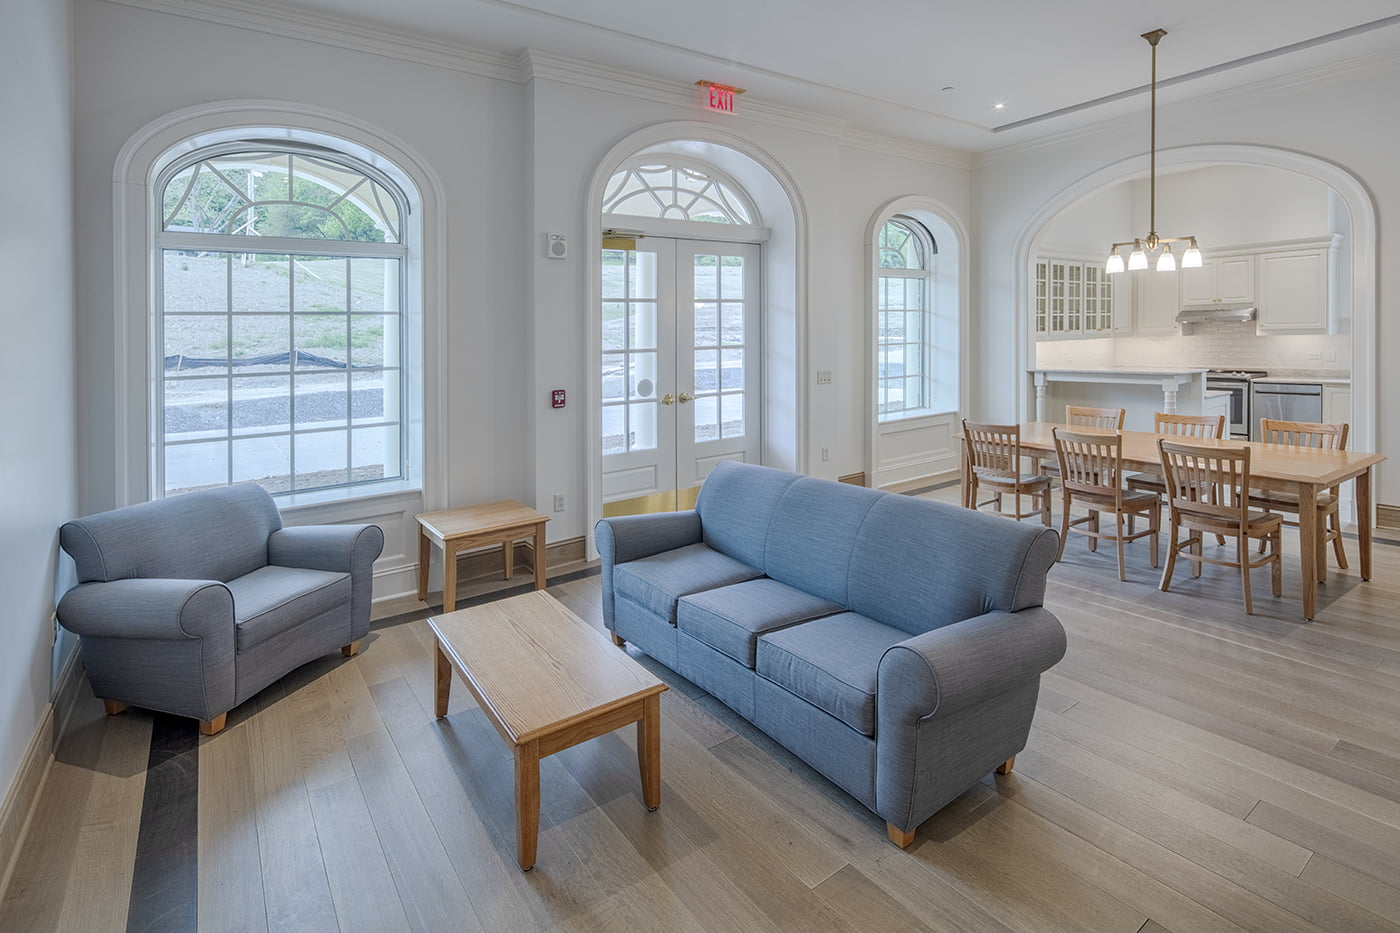 Colgate University Residence Halls Interior Room